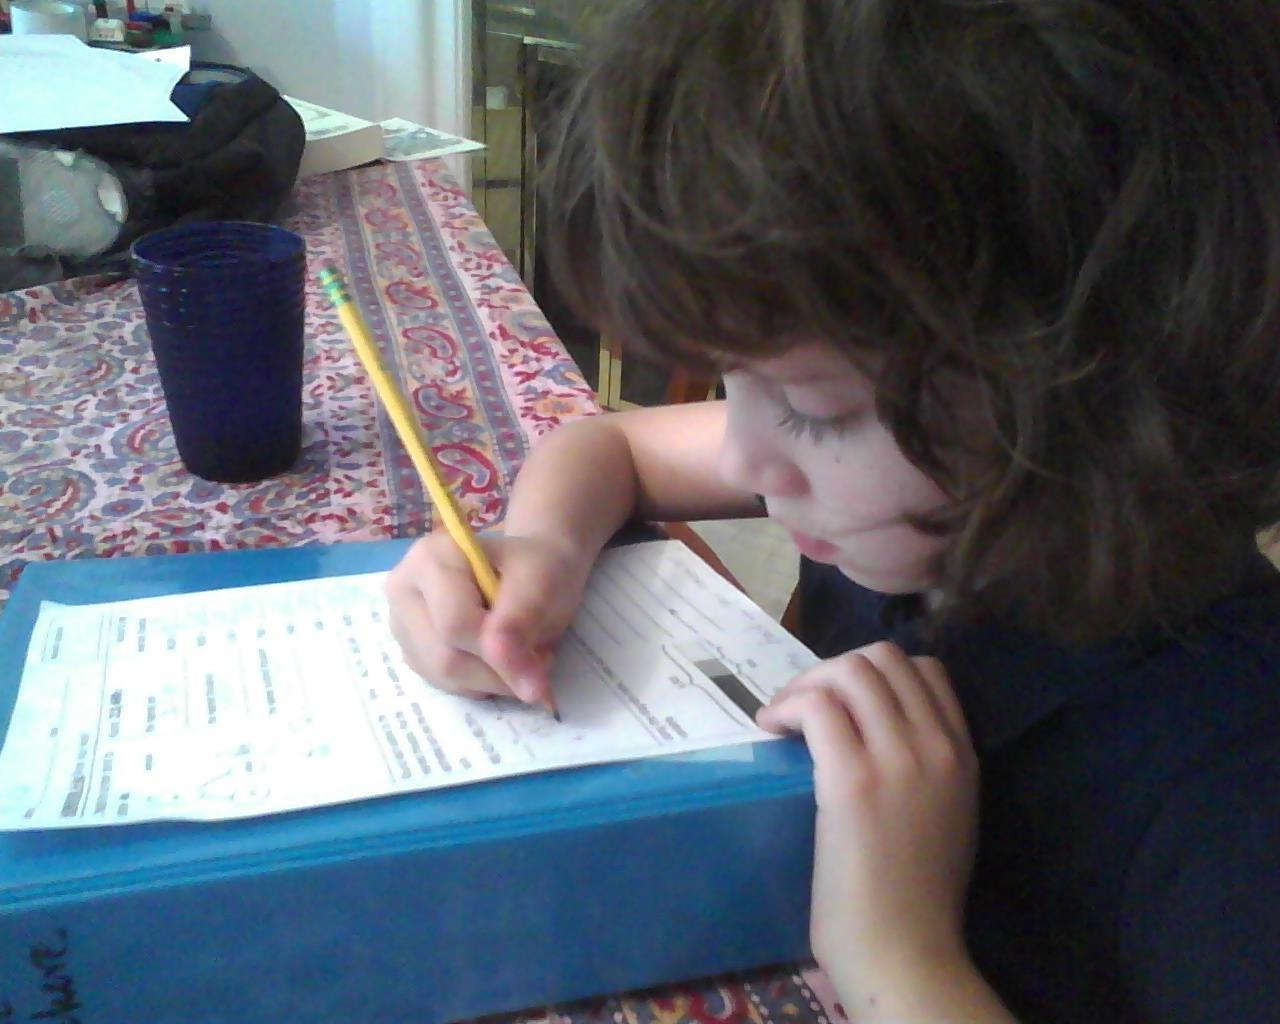 Alabama admissions essay photo 8